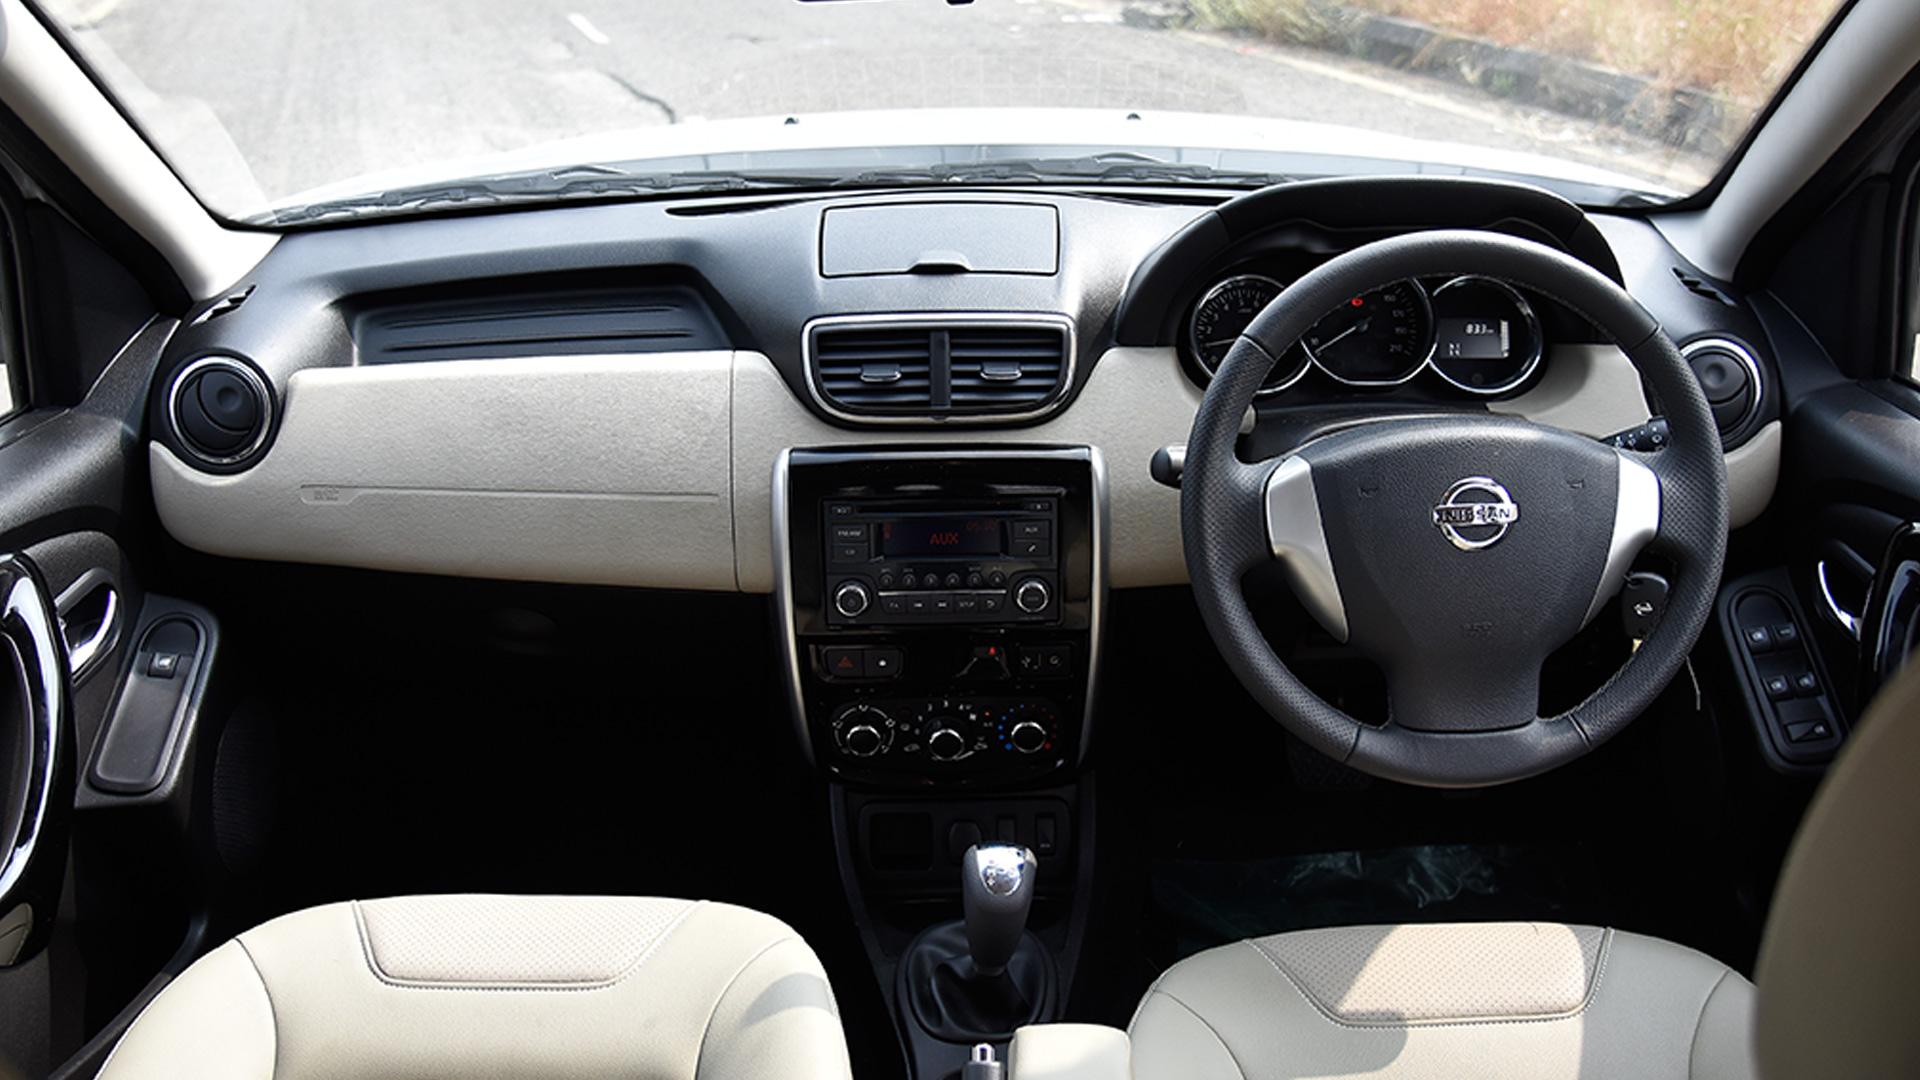 Nissan Terrano 2017 - Price, Mileage, Reviews ...